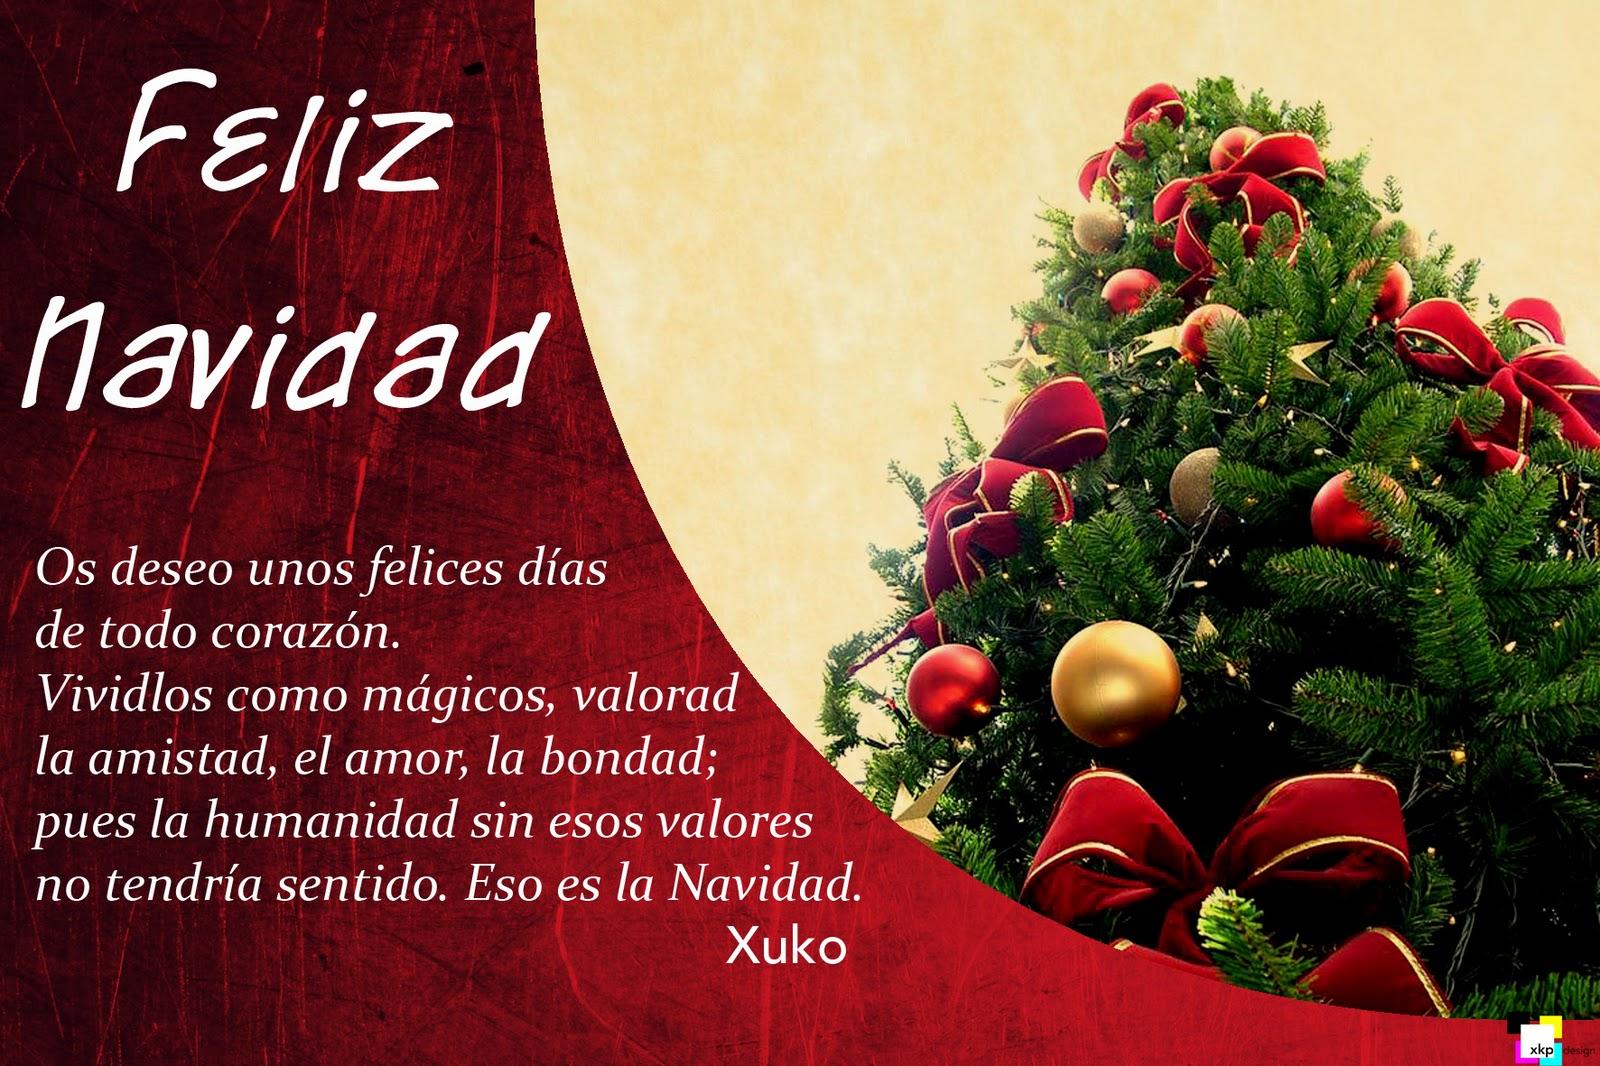 Imagenes para tarjetas de navidad - Dibujos tarjetas navidenas ...